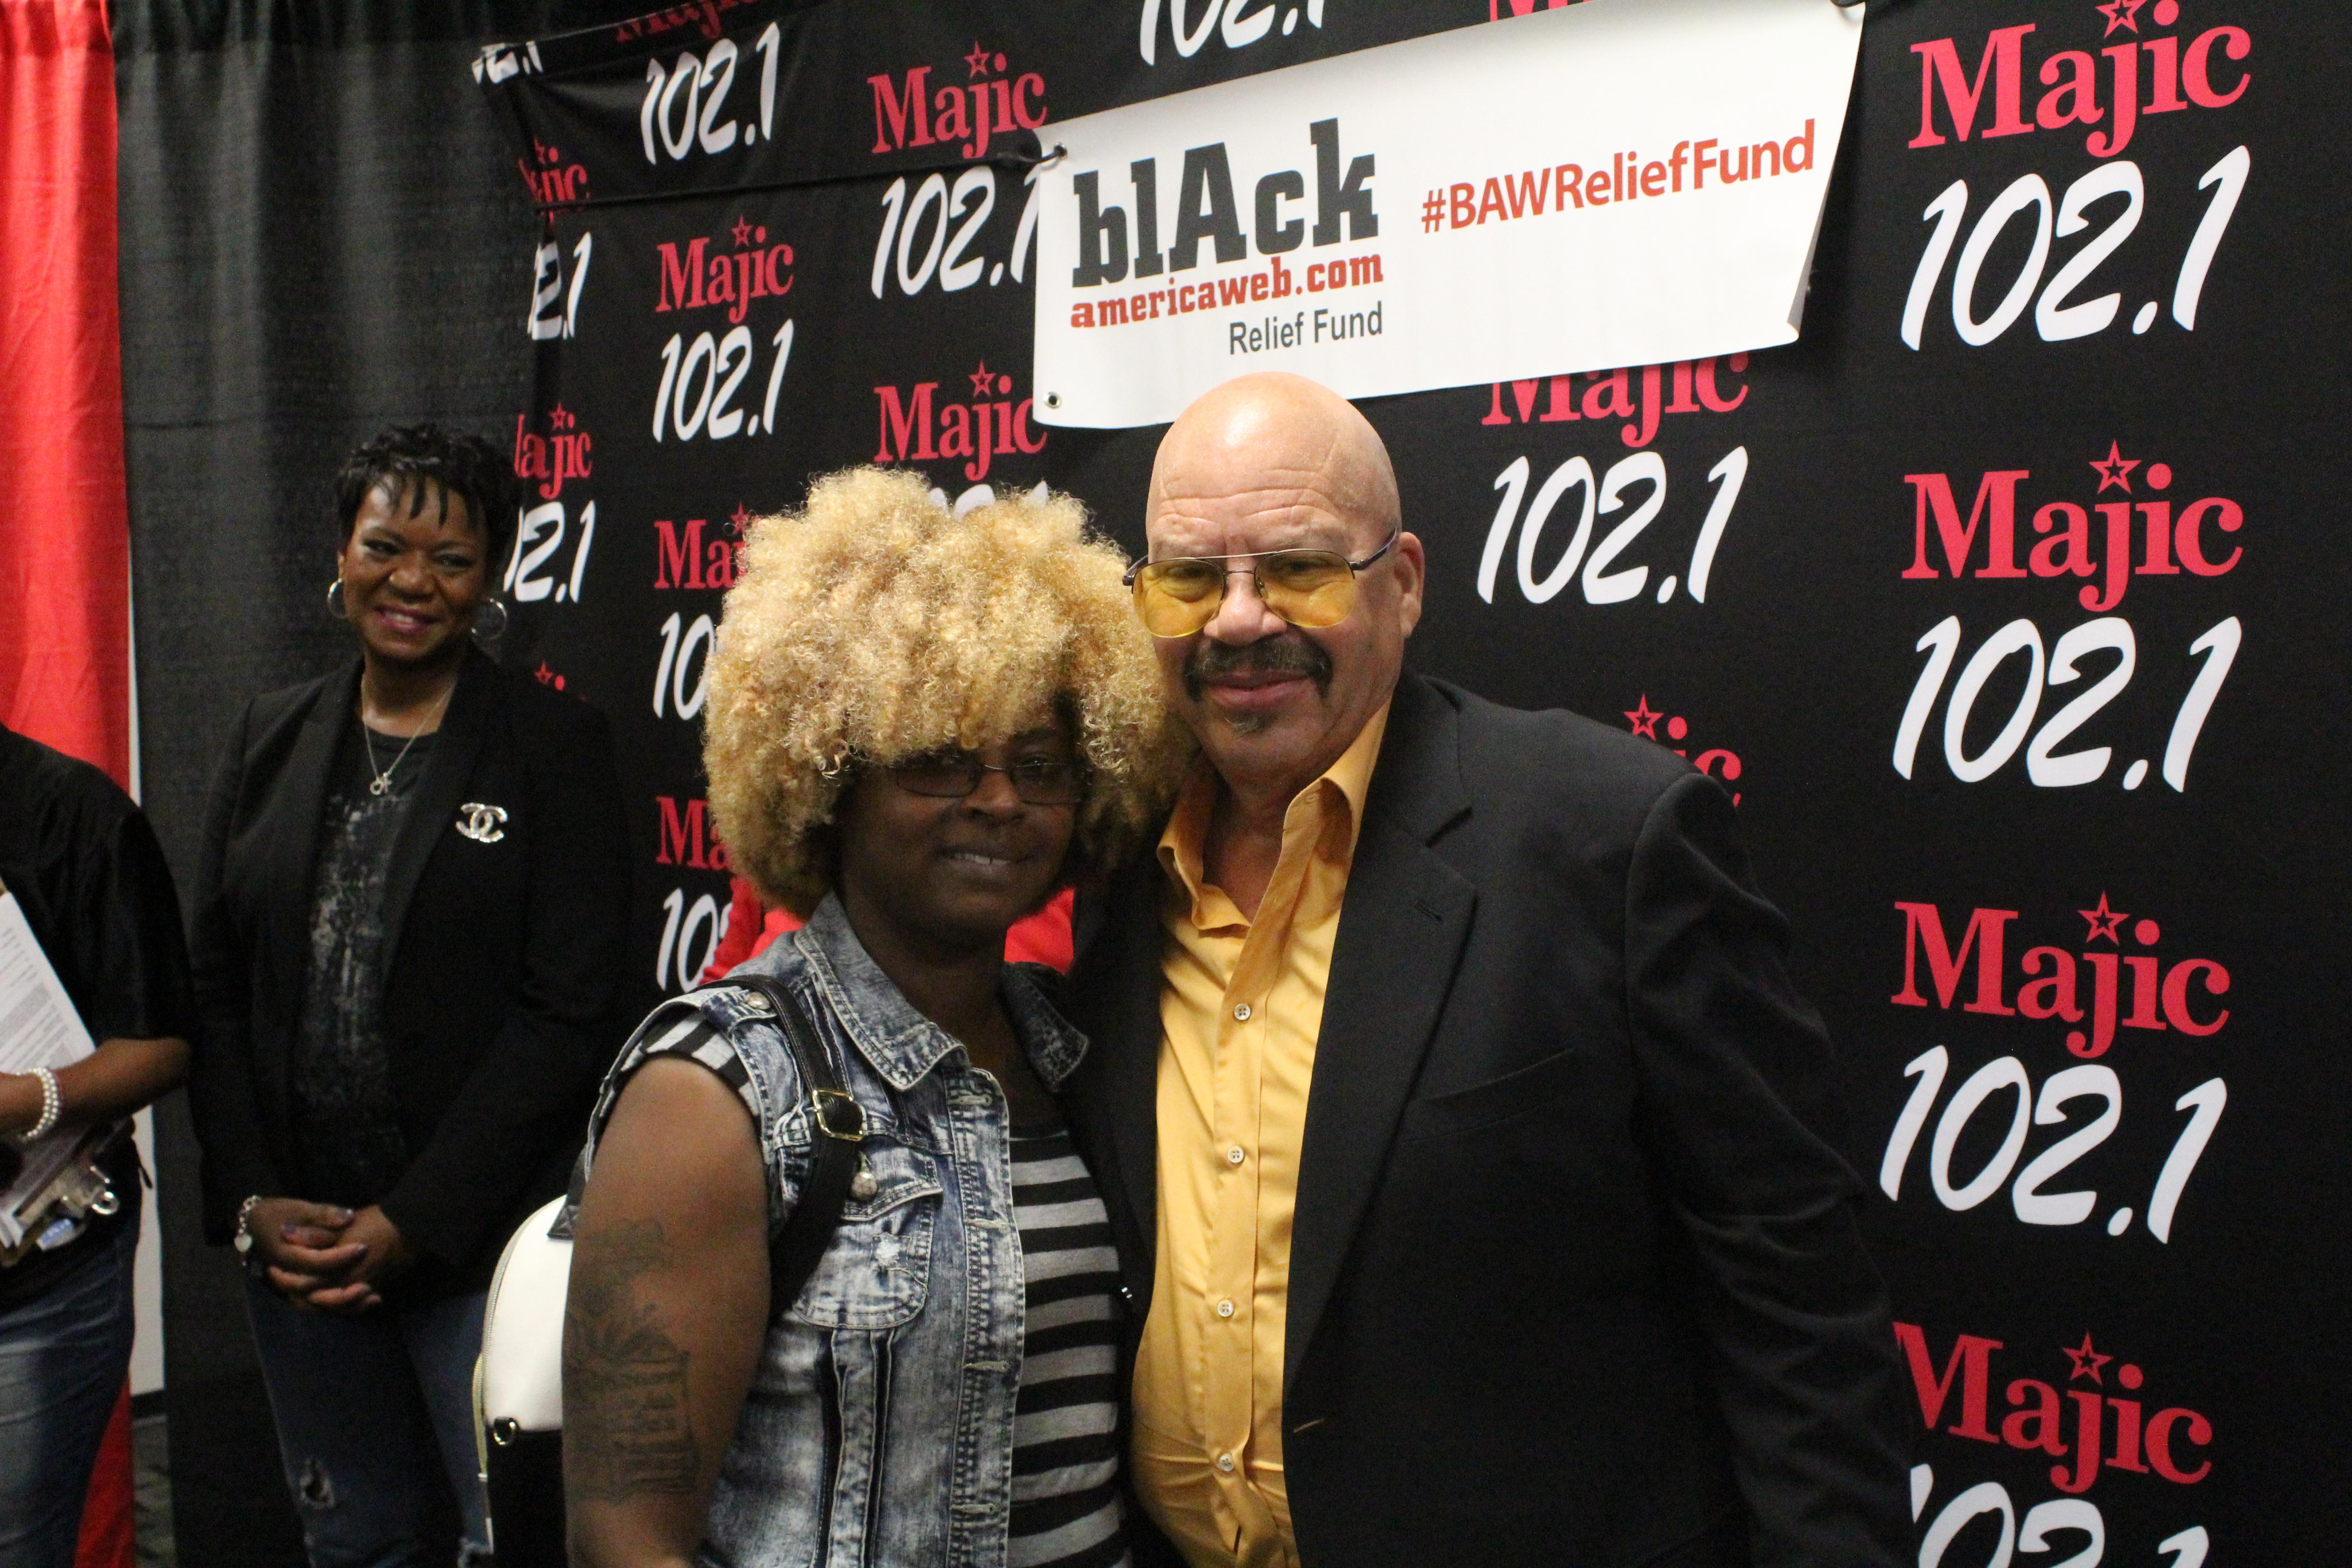 Black American Web Relief Fund 50K Giveaway Recap